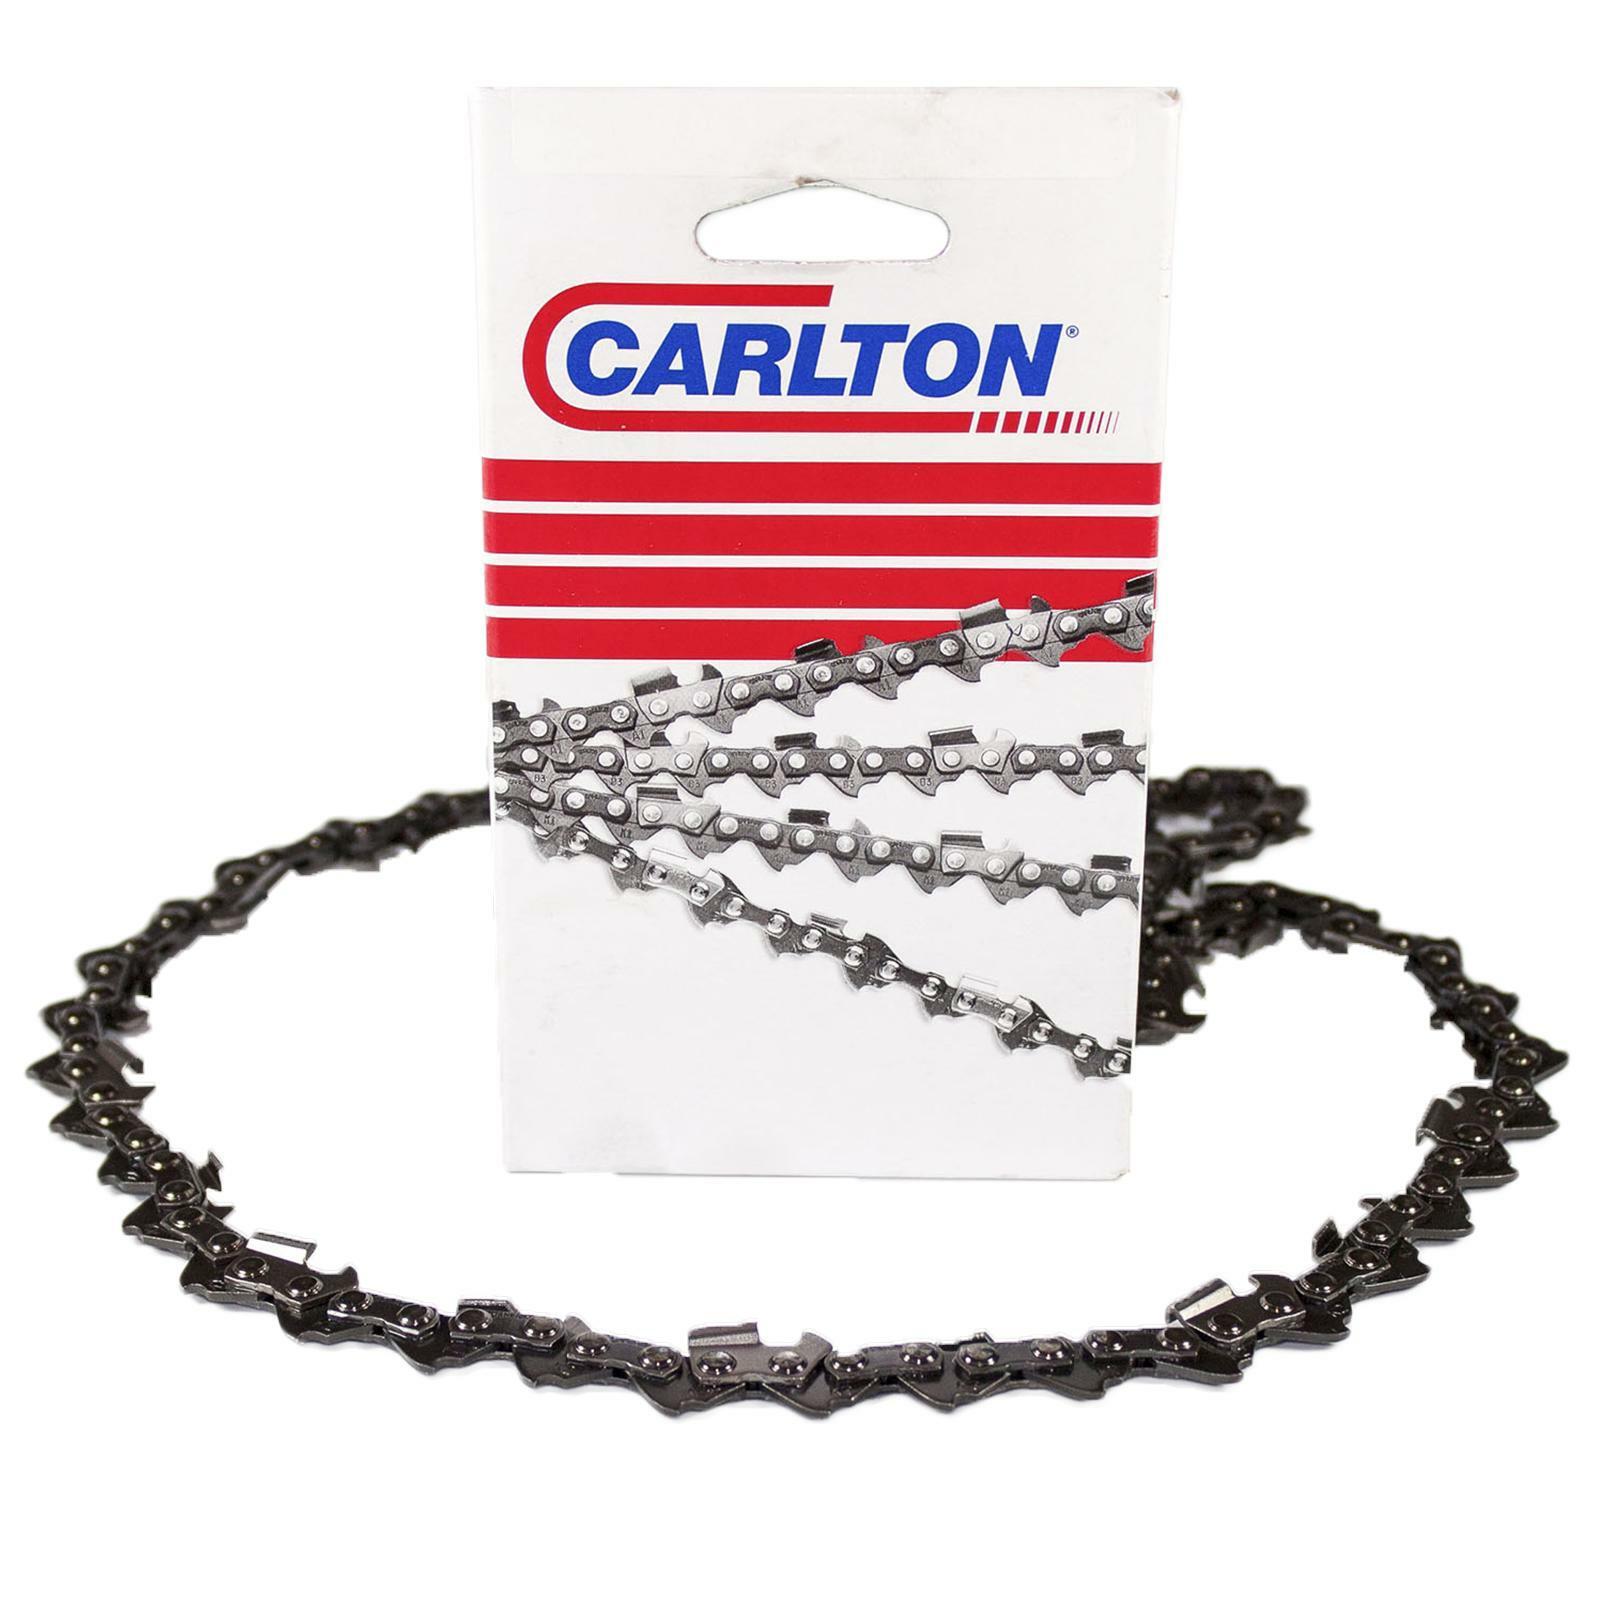 carlton catena per motosega carlton 3/8 sp 1.3 cm 35 50 maglie